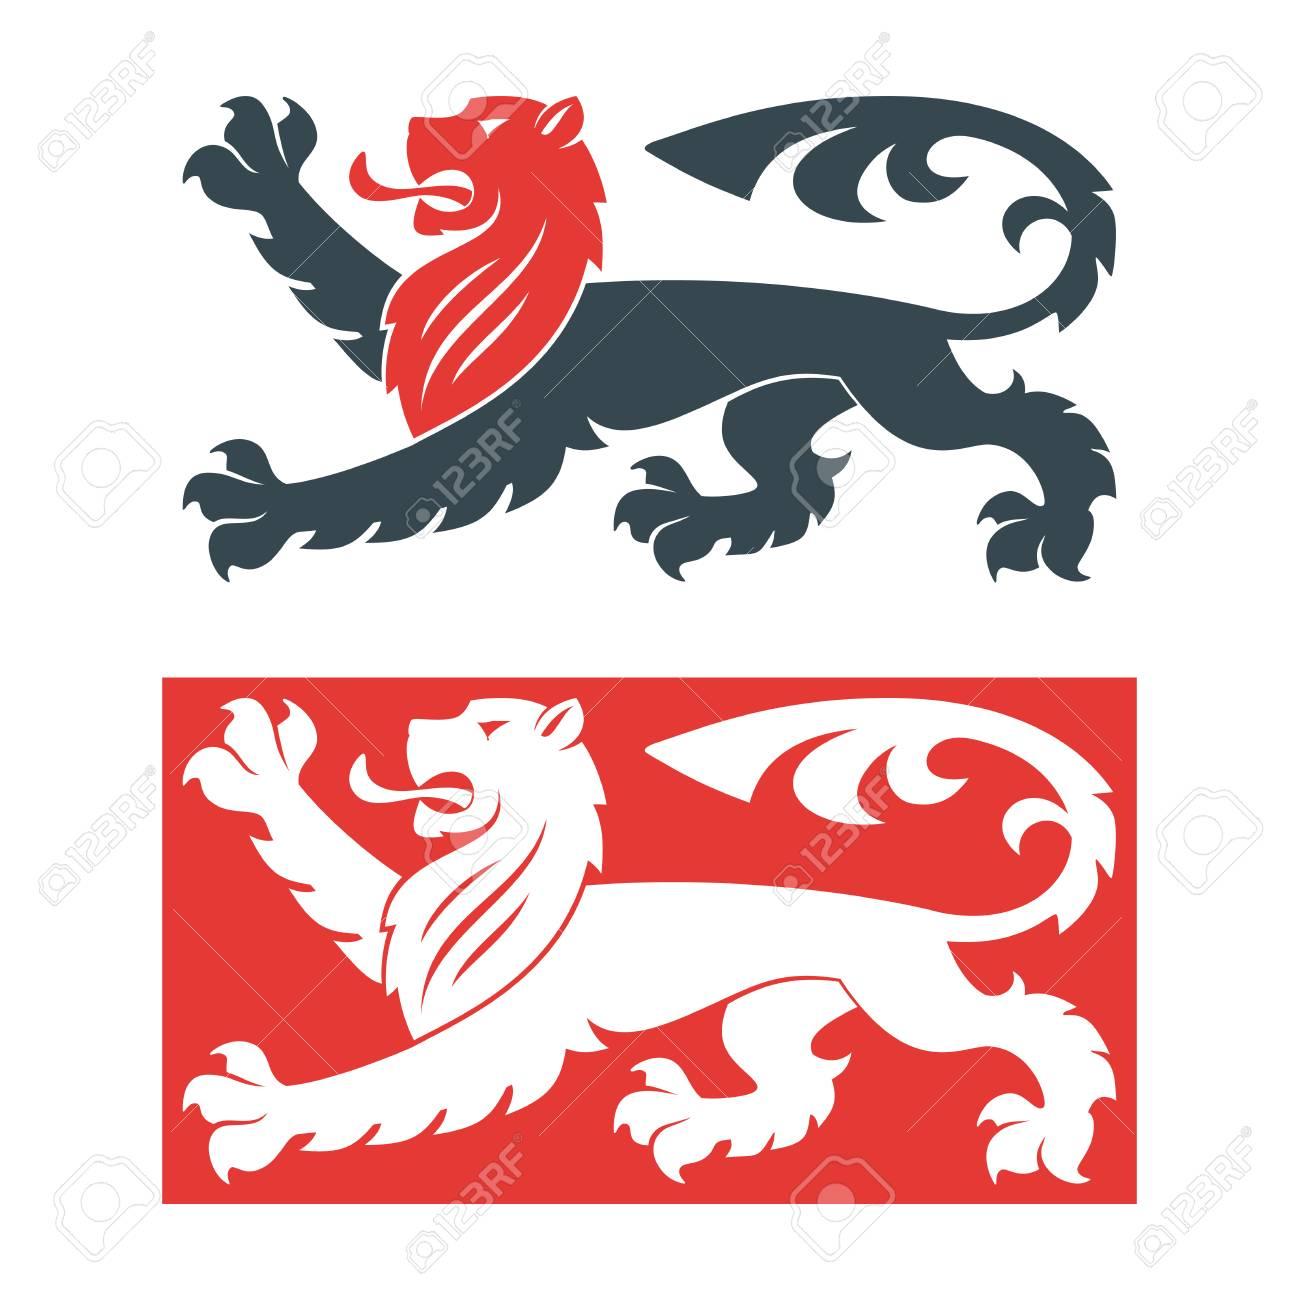 Vector Illustration Of Black Lions For Heraldry Or Tattoo Vintage